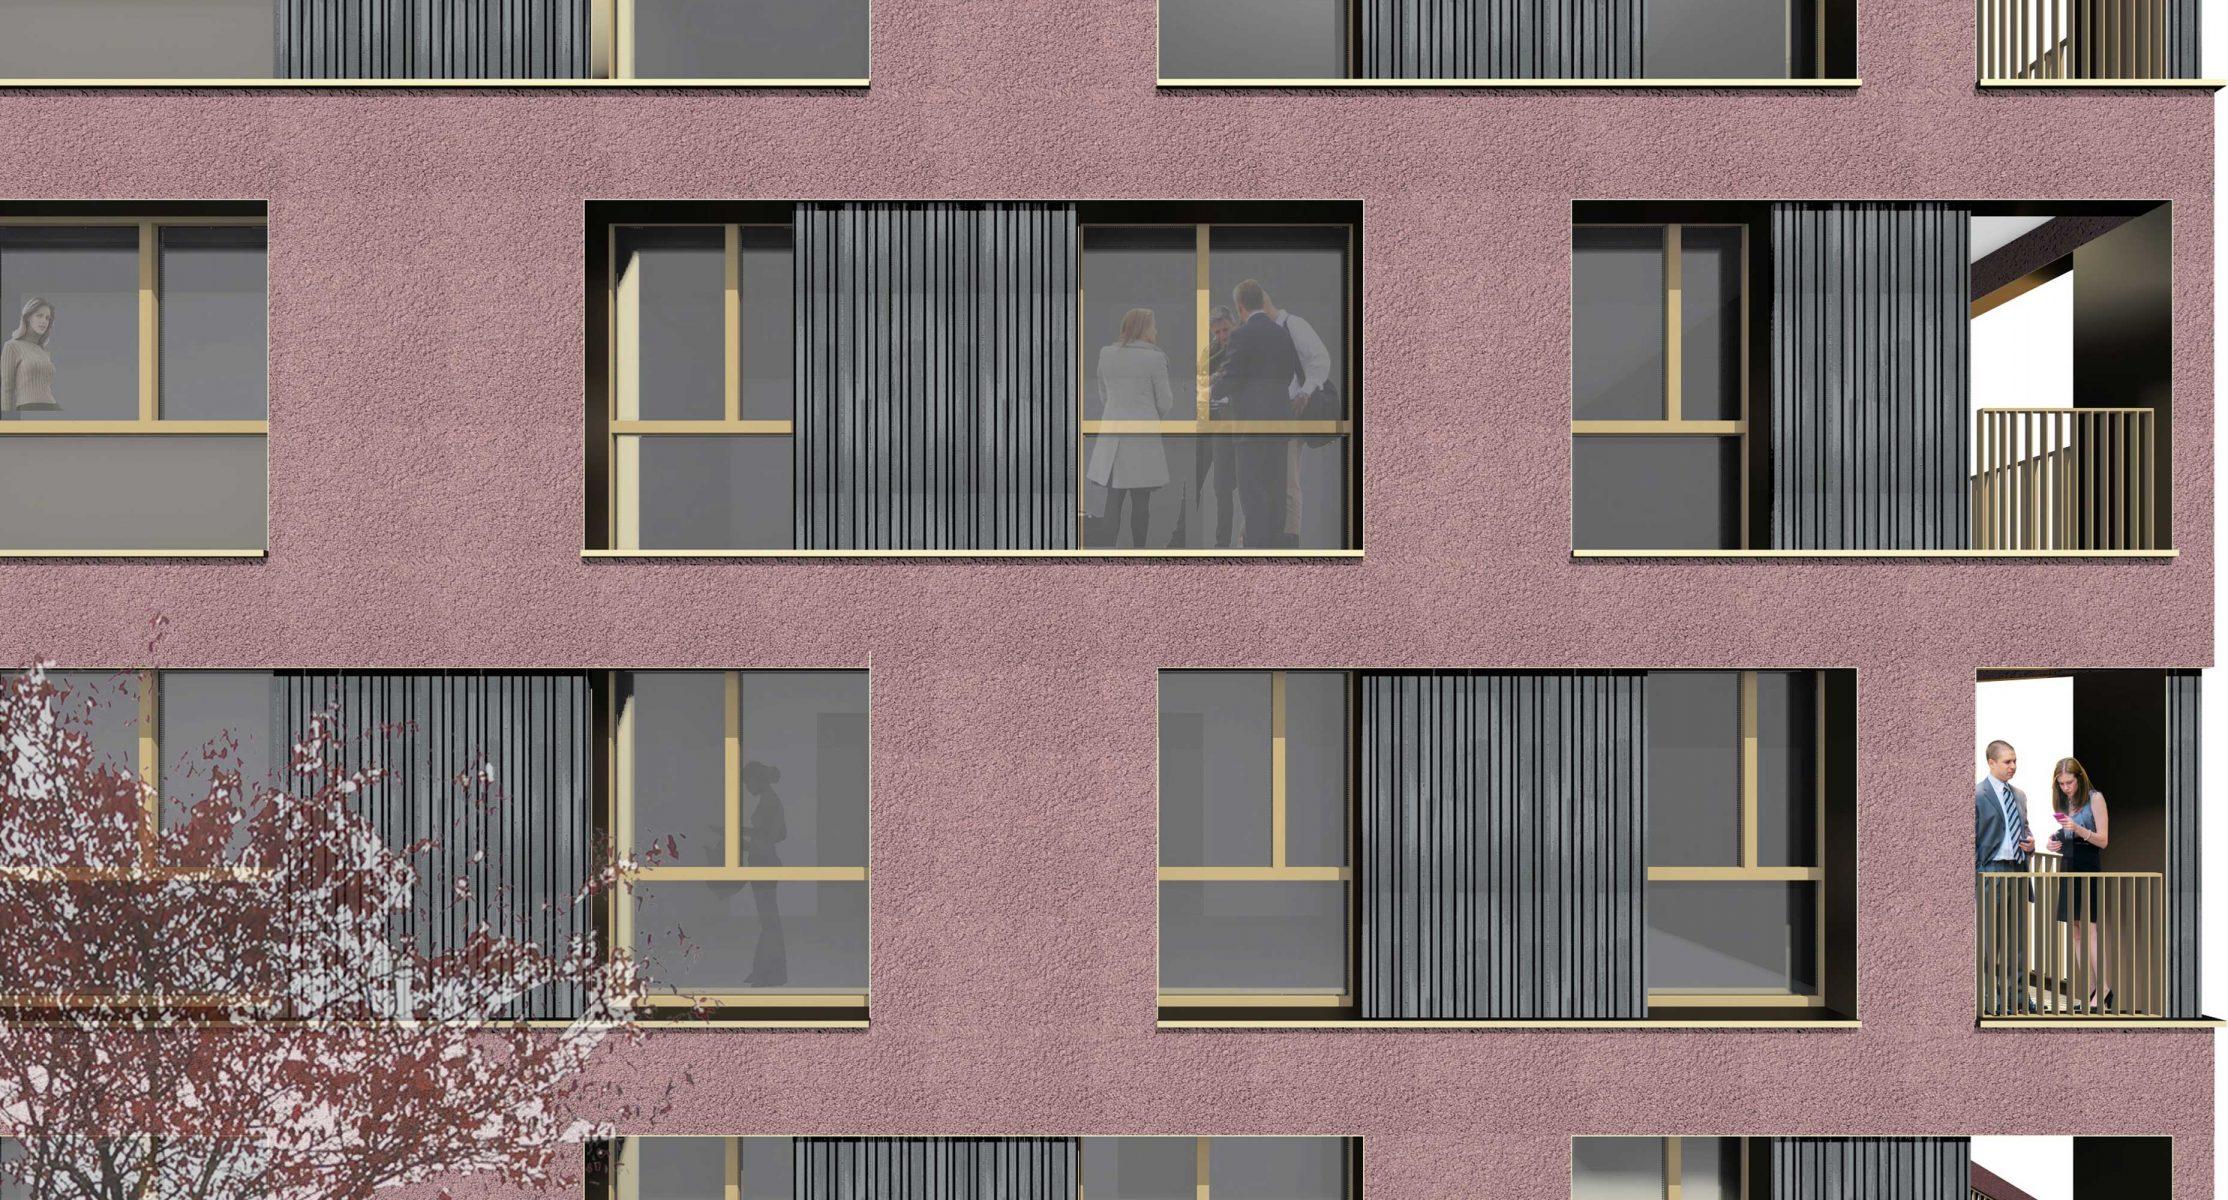 sous-bois-facade-detail-fac-17-boir-noir-